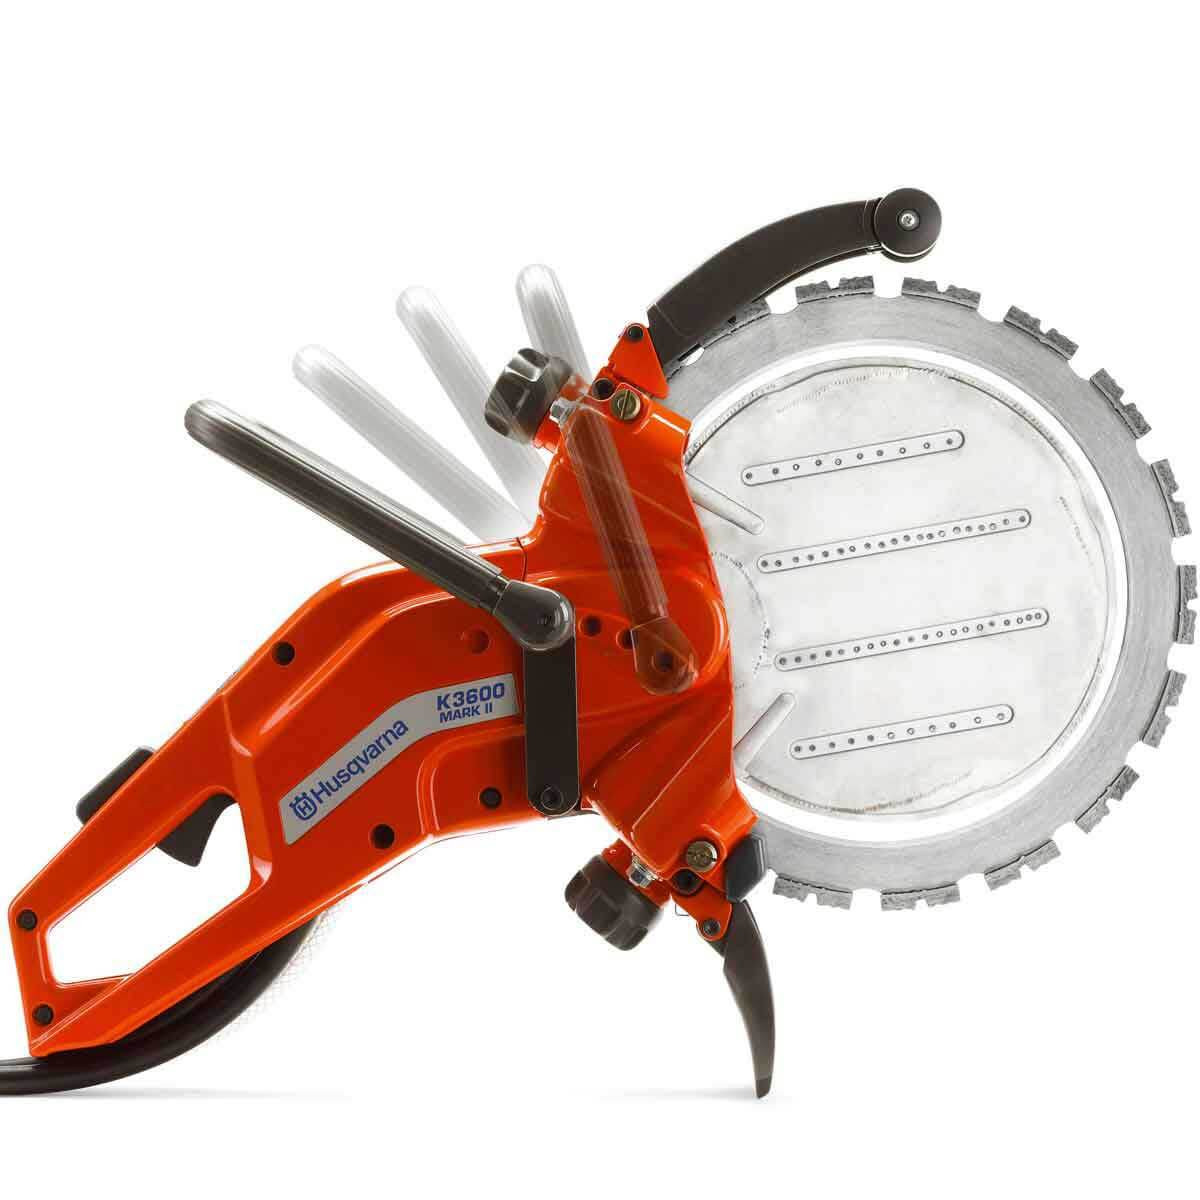 Husqvarna Hydraulic power cutter